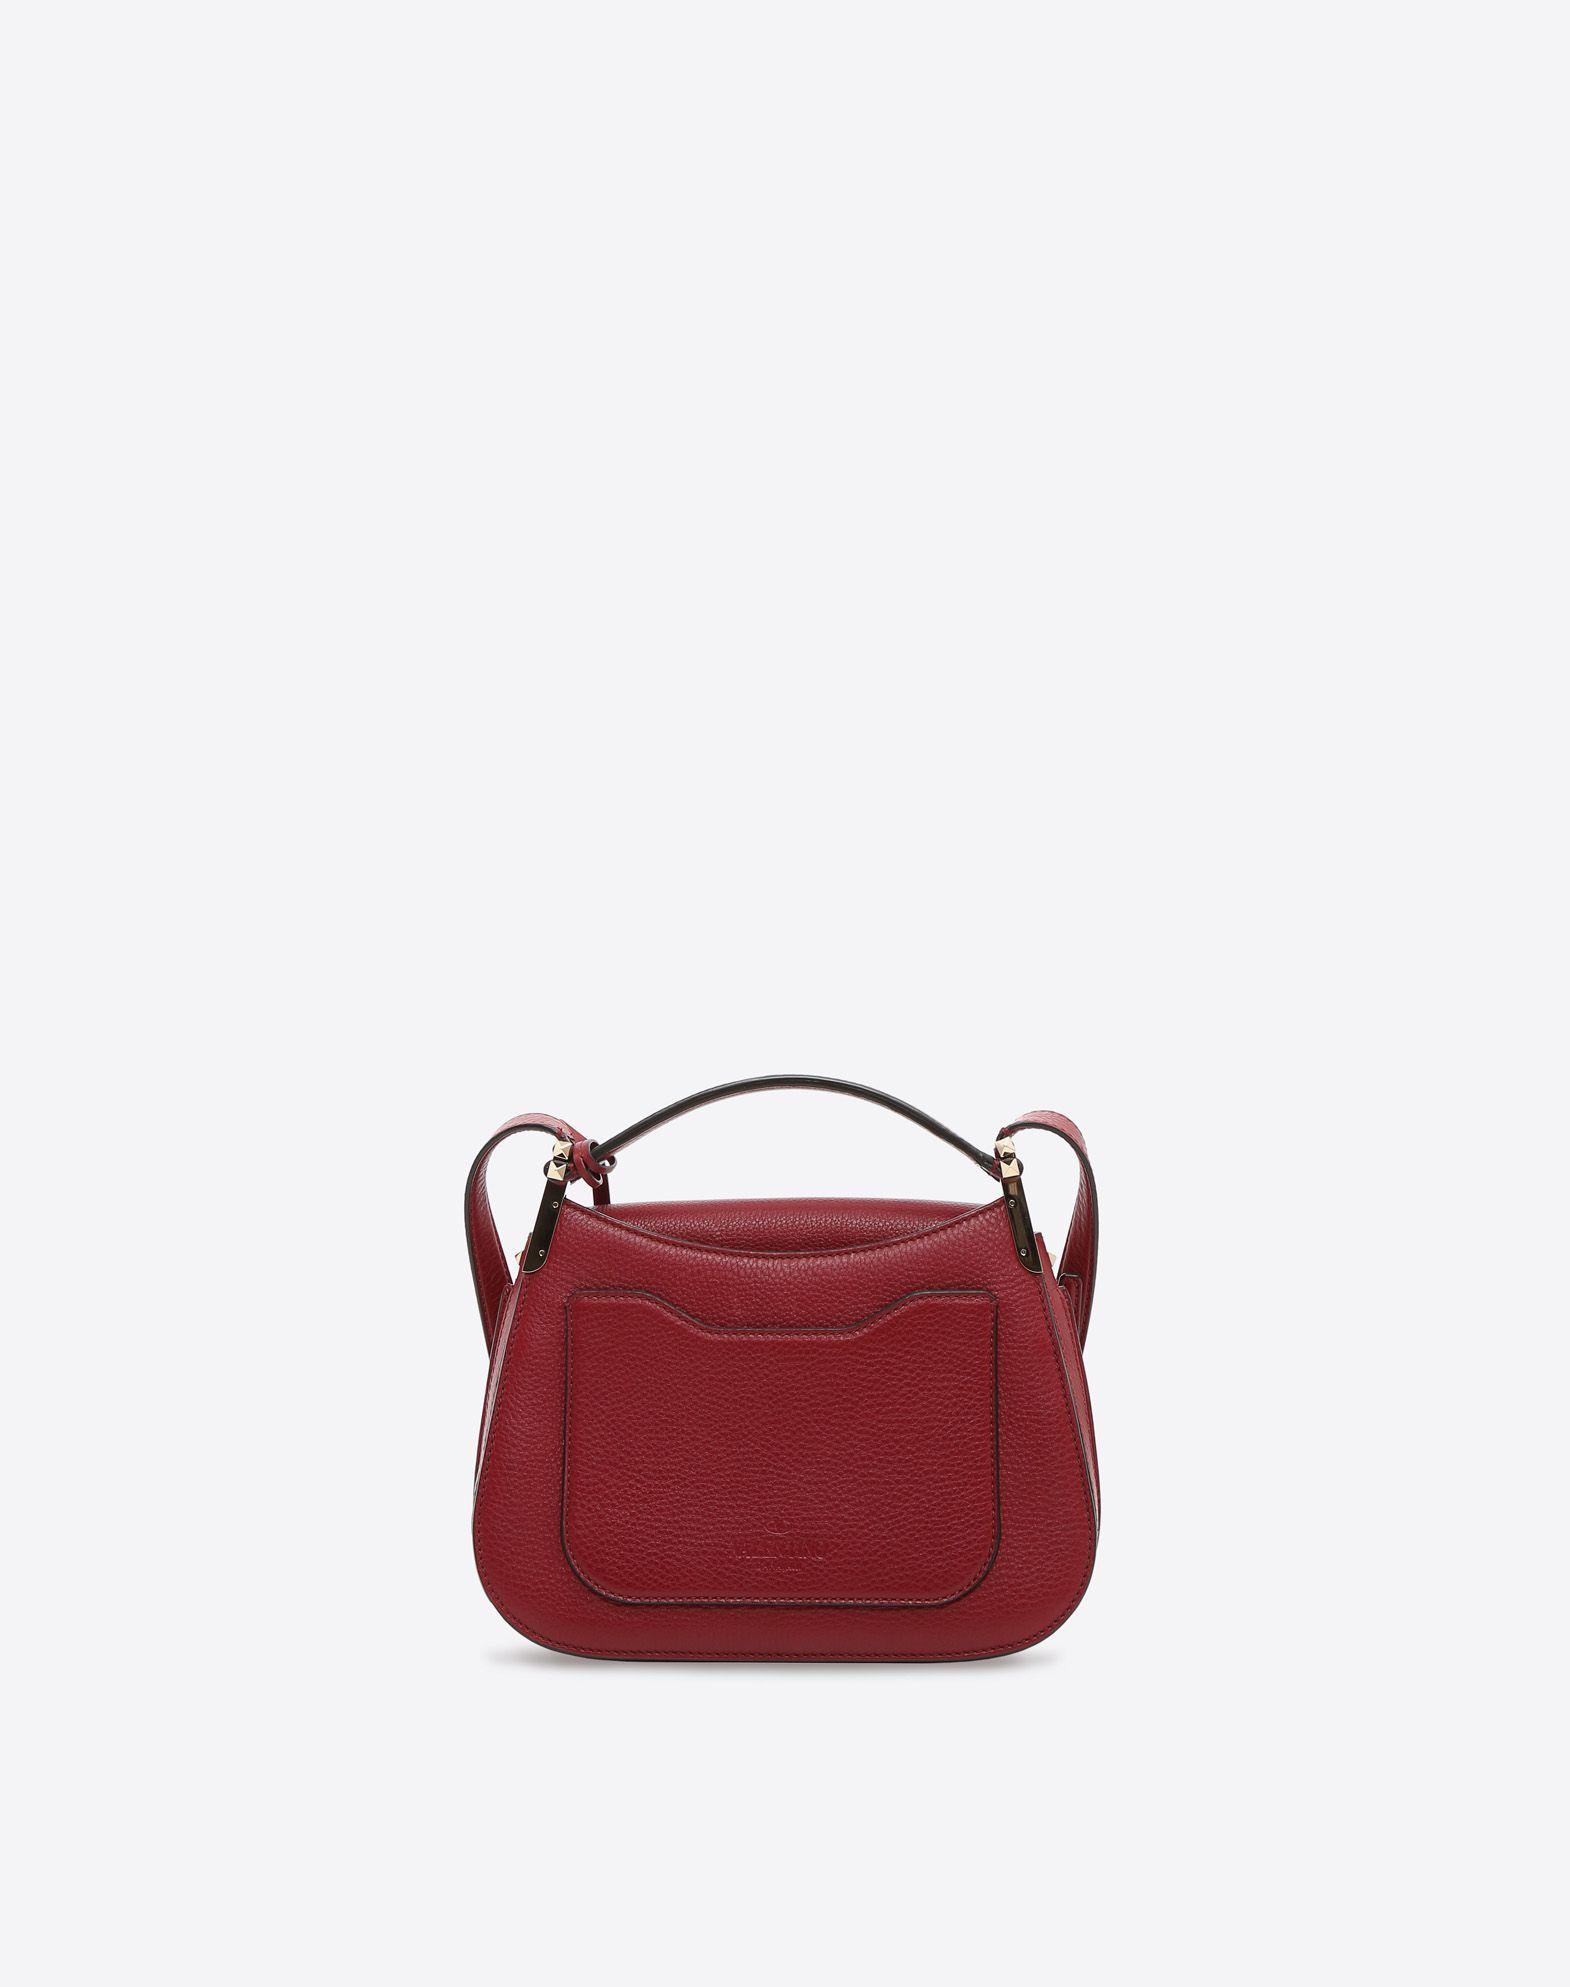 VALENTINO GARAVANI Joylock Messenger Bag Shoulder bag D d